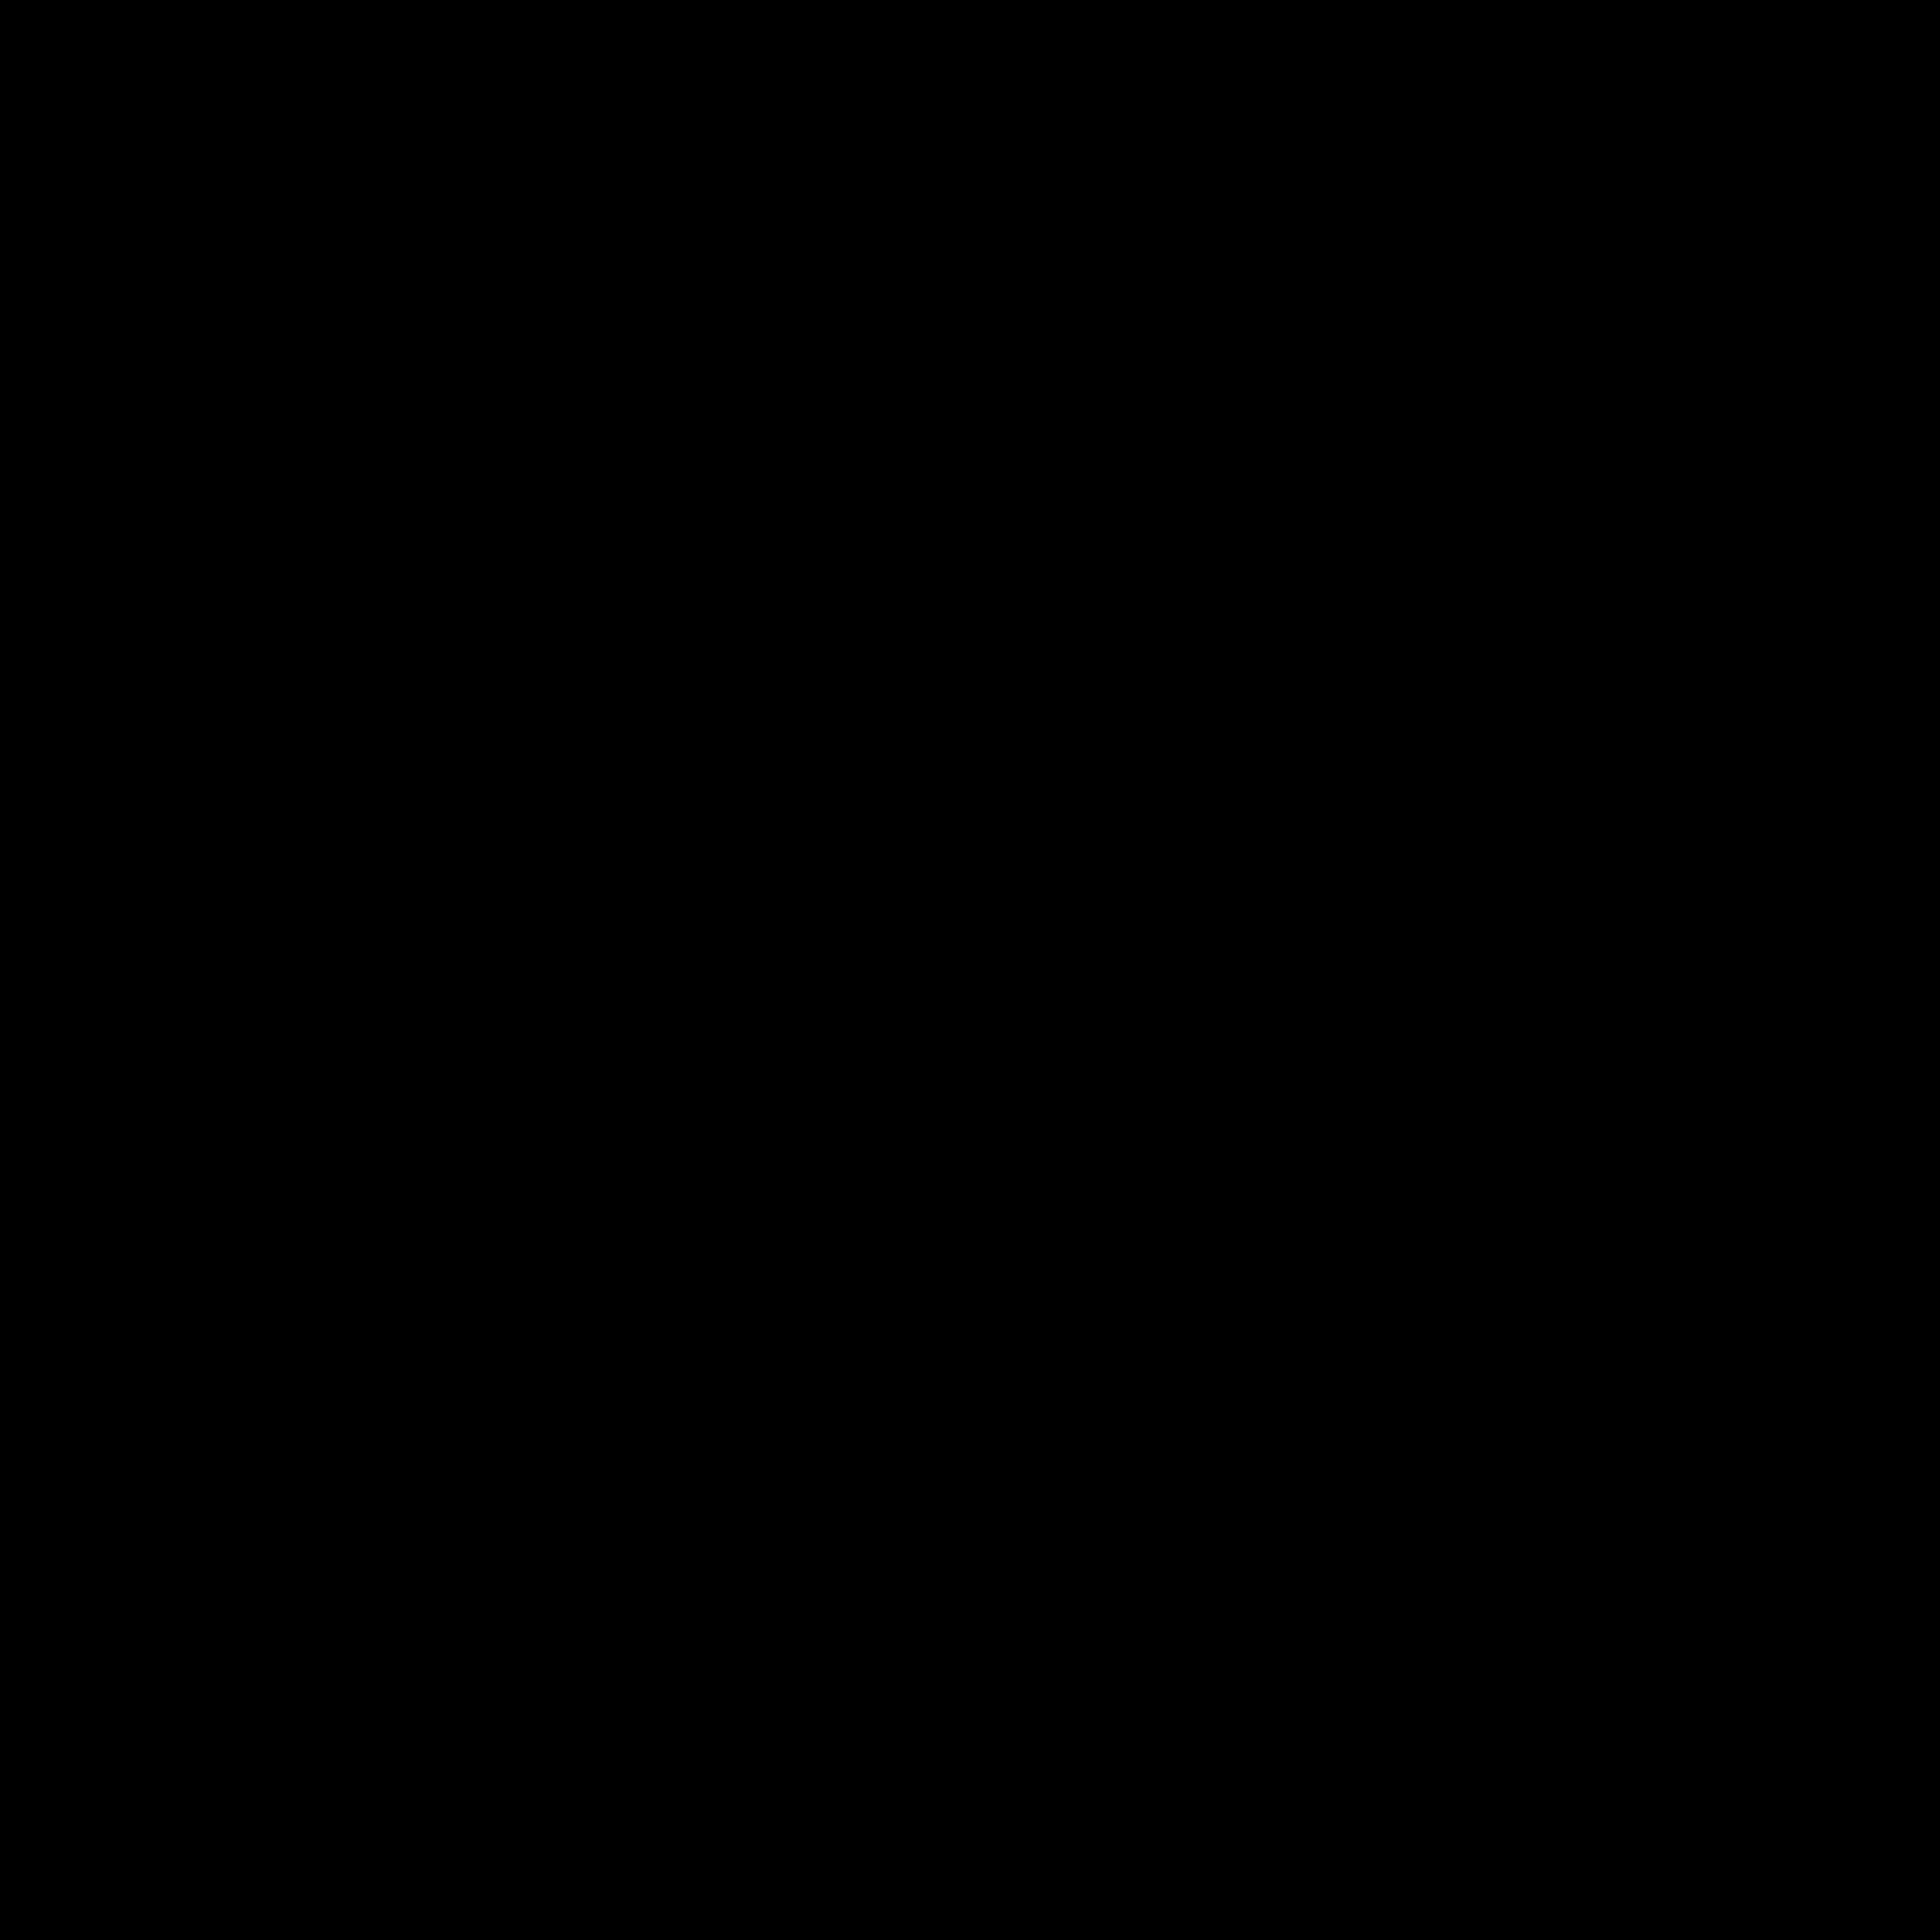 Wachstumsdiagramm-Symbol